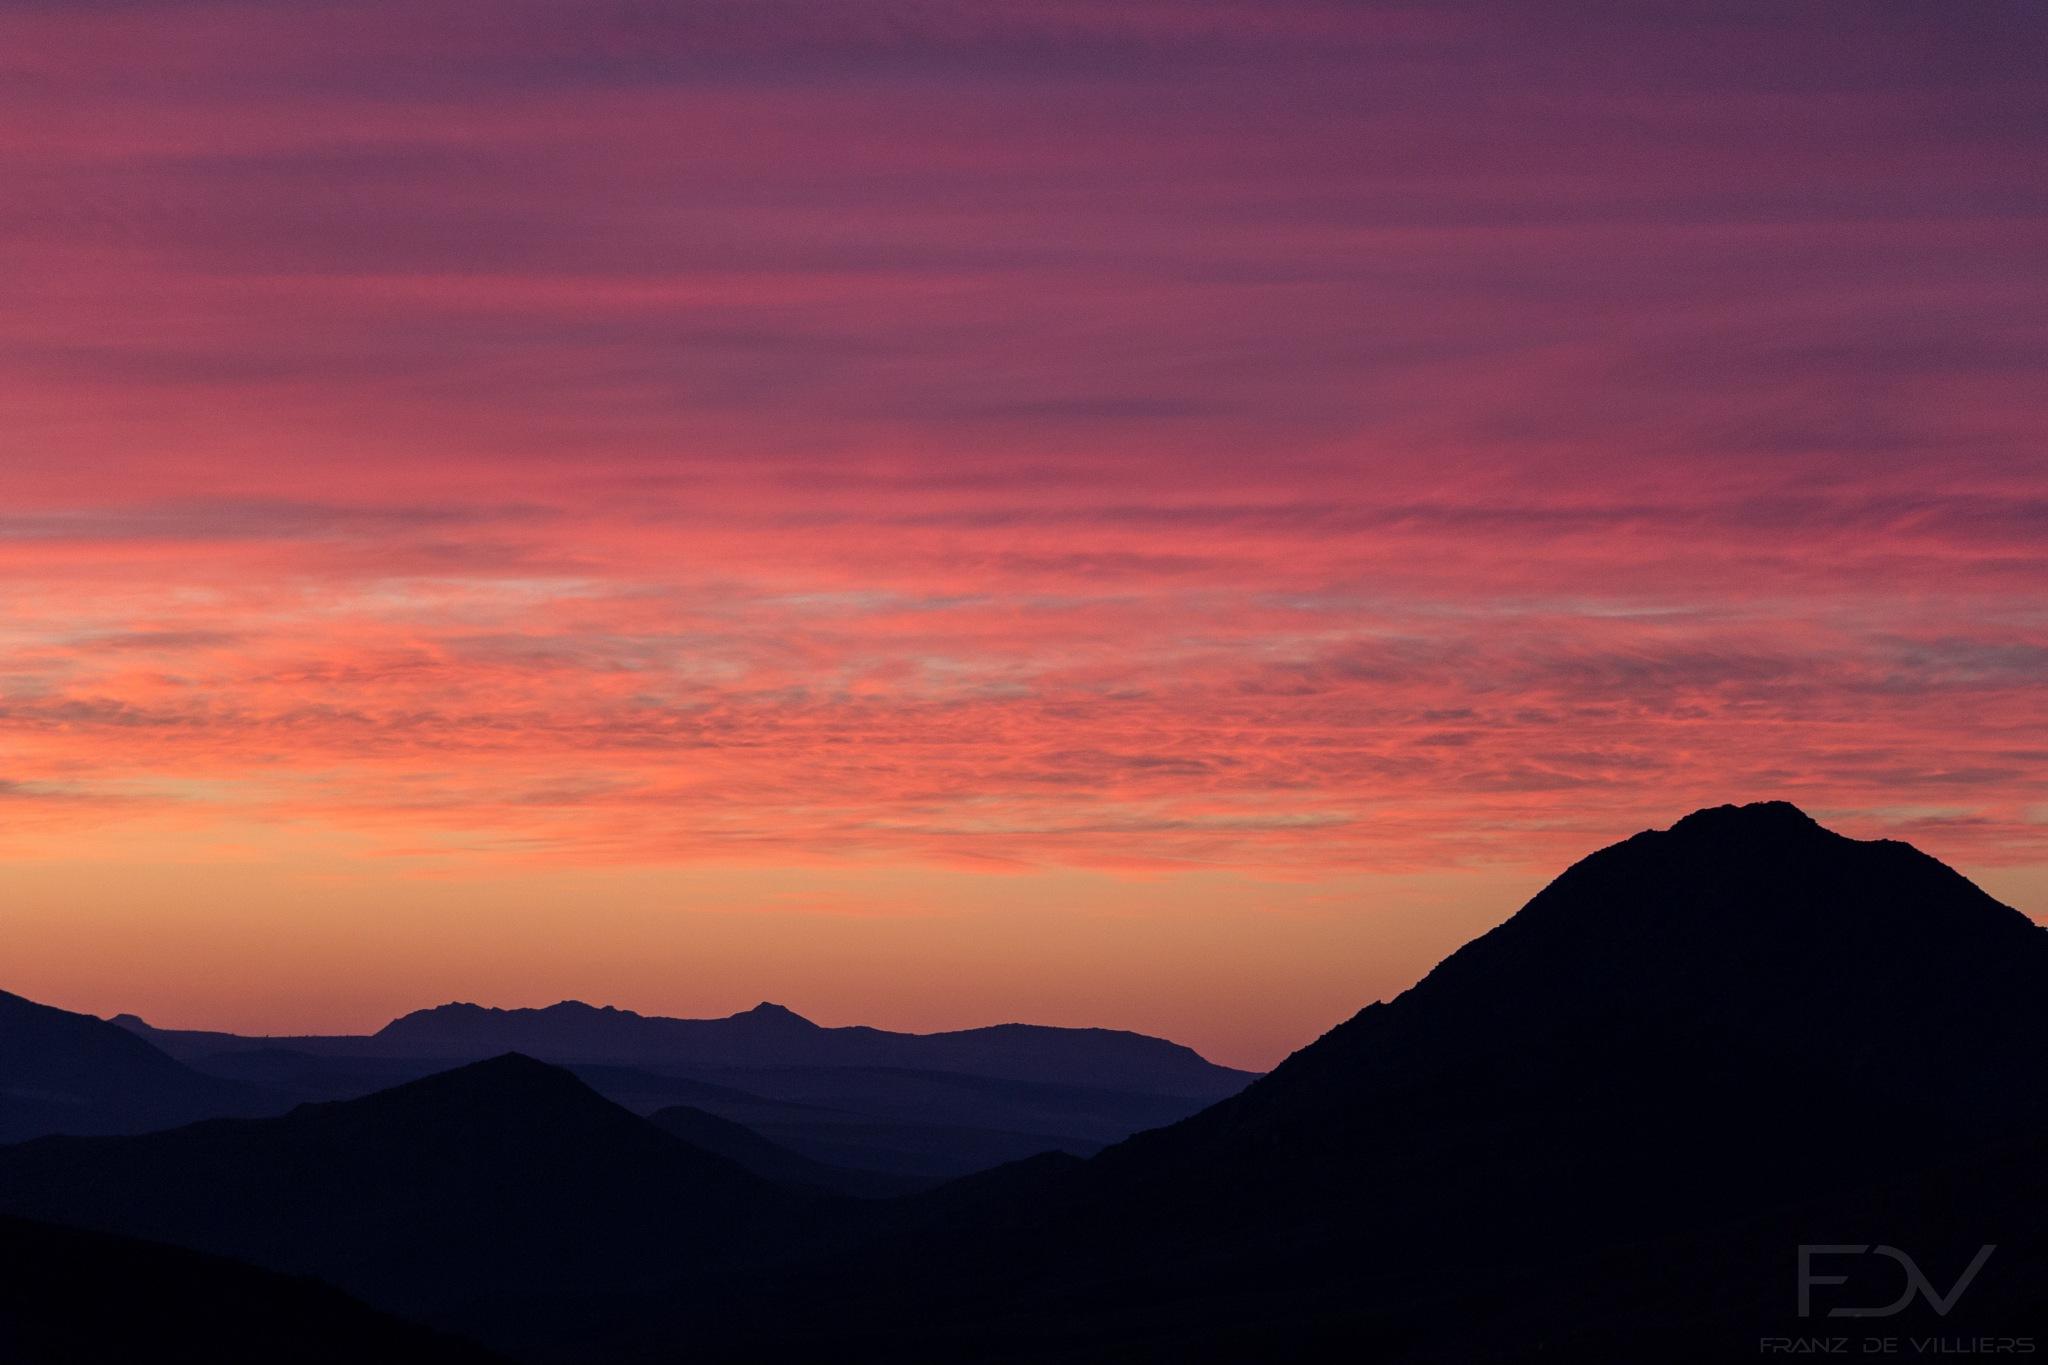 Cederberg Sunset 2. by franzdev